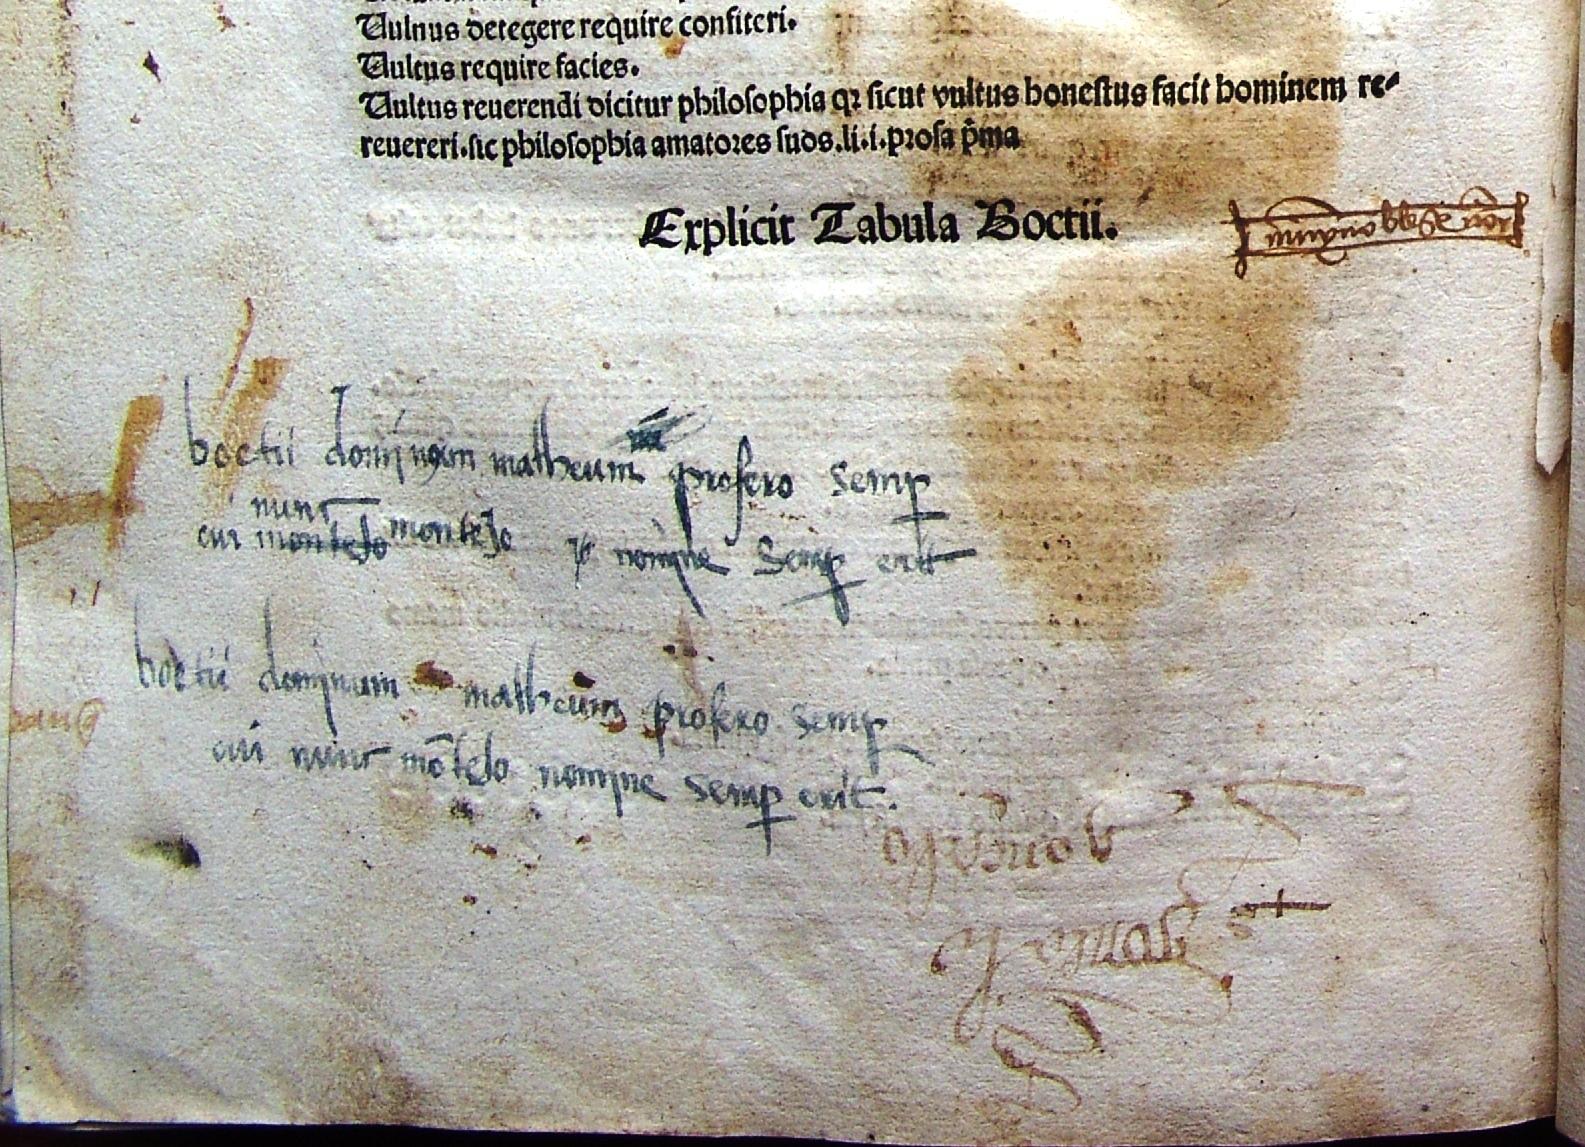 Plana alusiva a Boecio, al final de la obra.